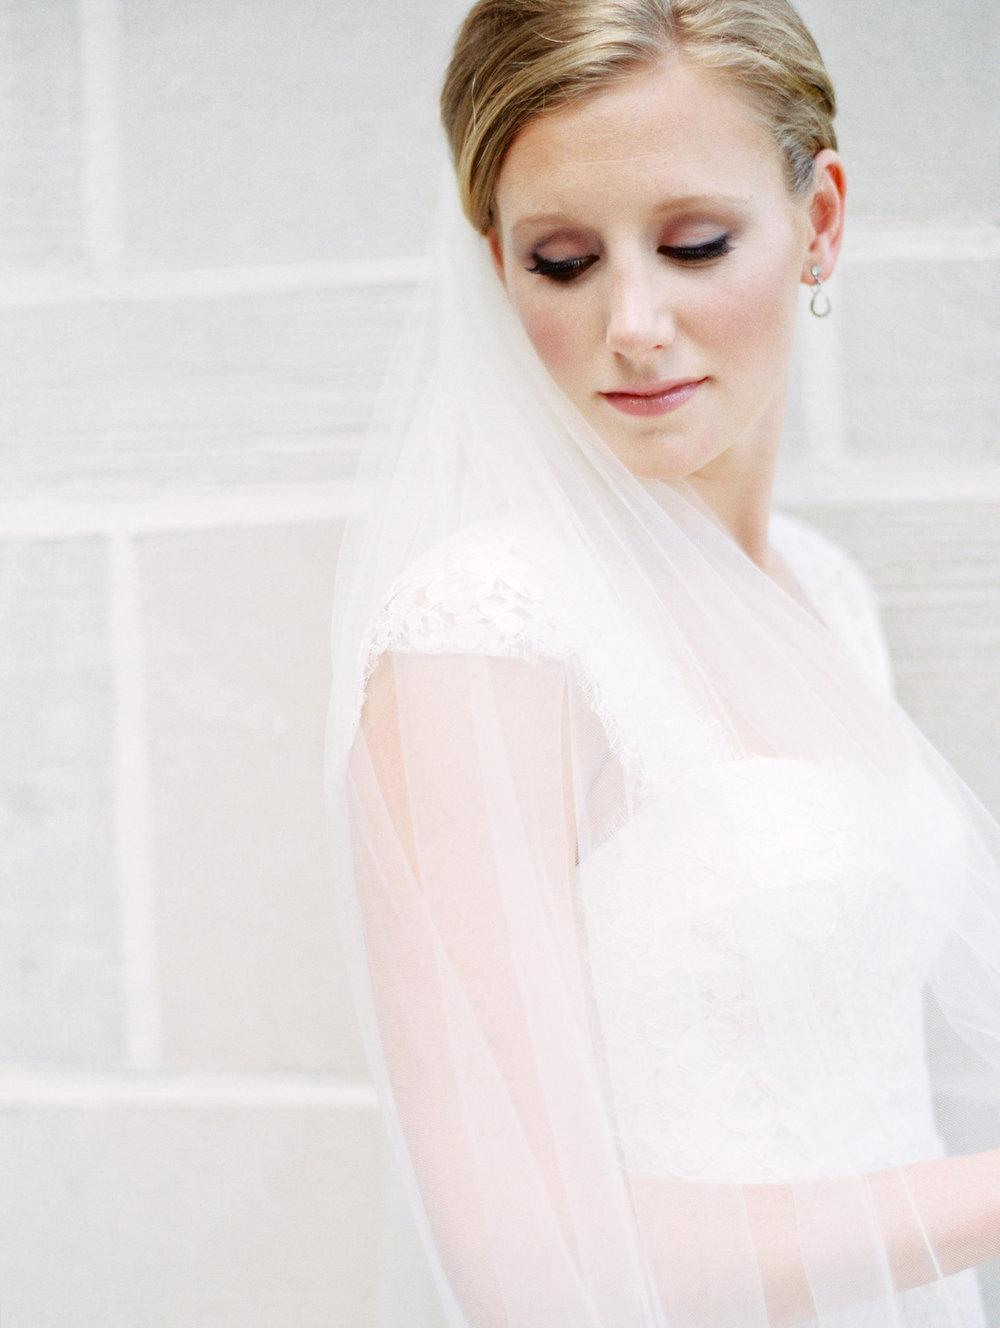 0091_0095_Houston-Film-Bridal-Photographer.jpg